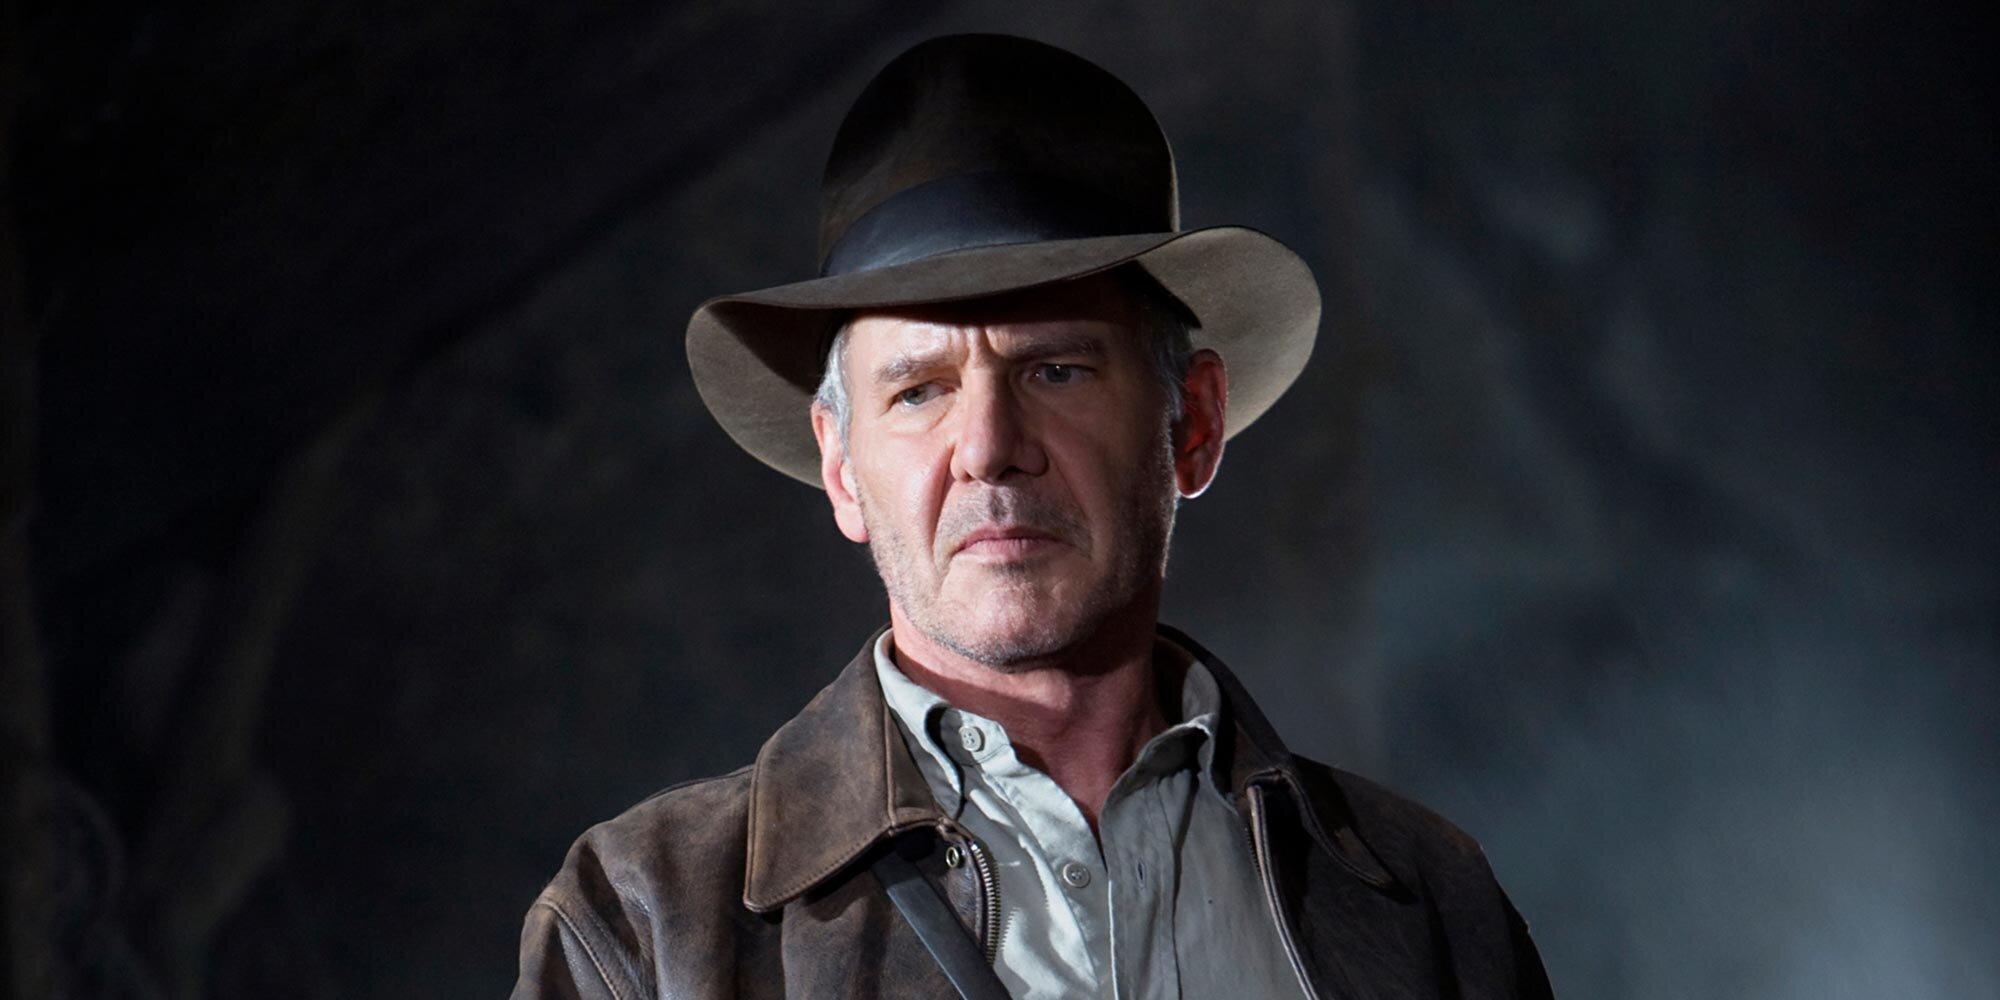 Harrison Ford injures shoulder while shooting 'Indiana Jones 5'